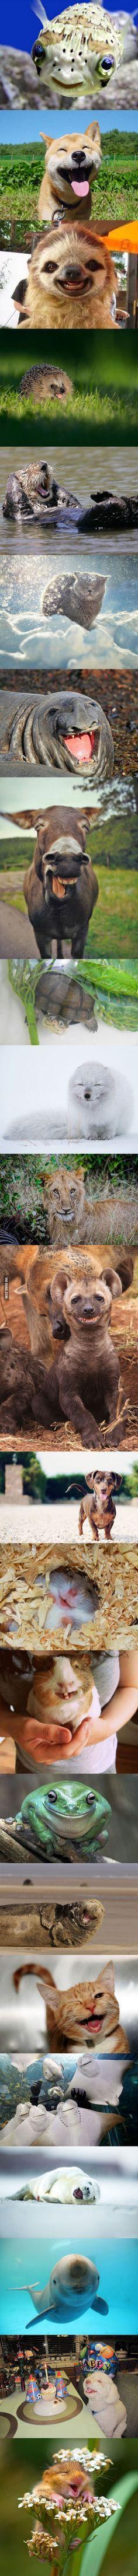 The sloth kills!